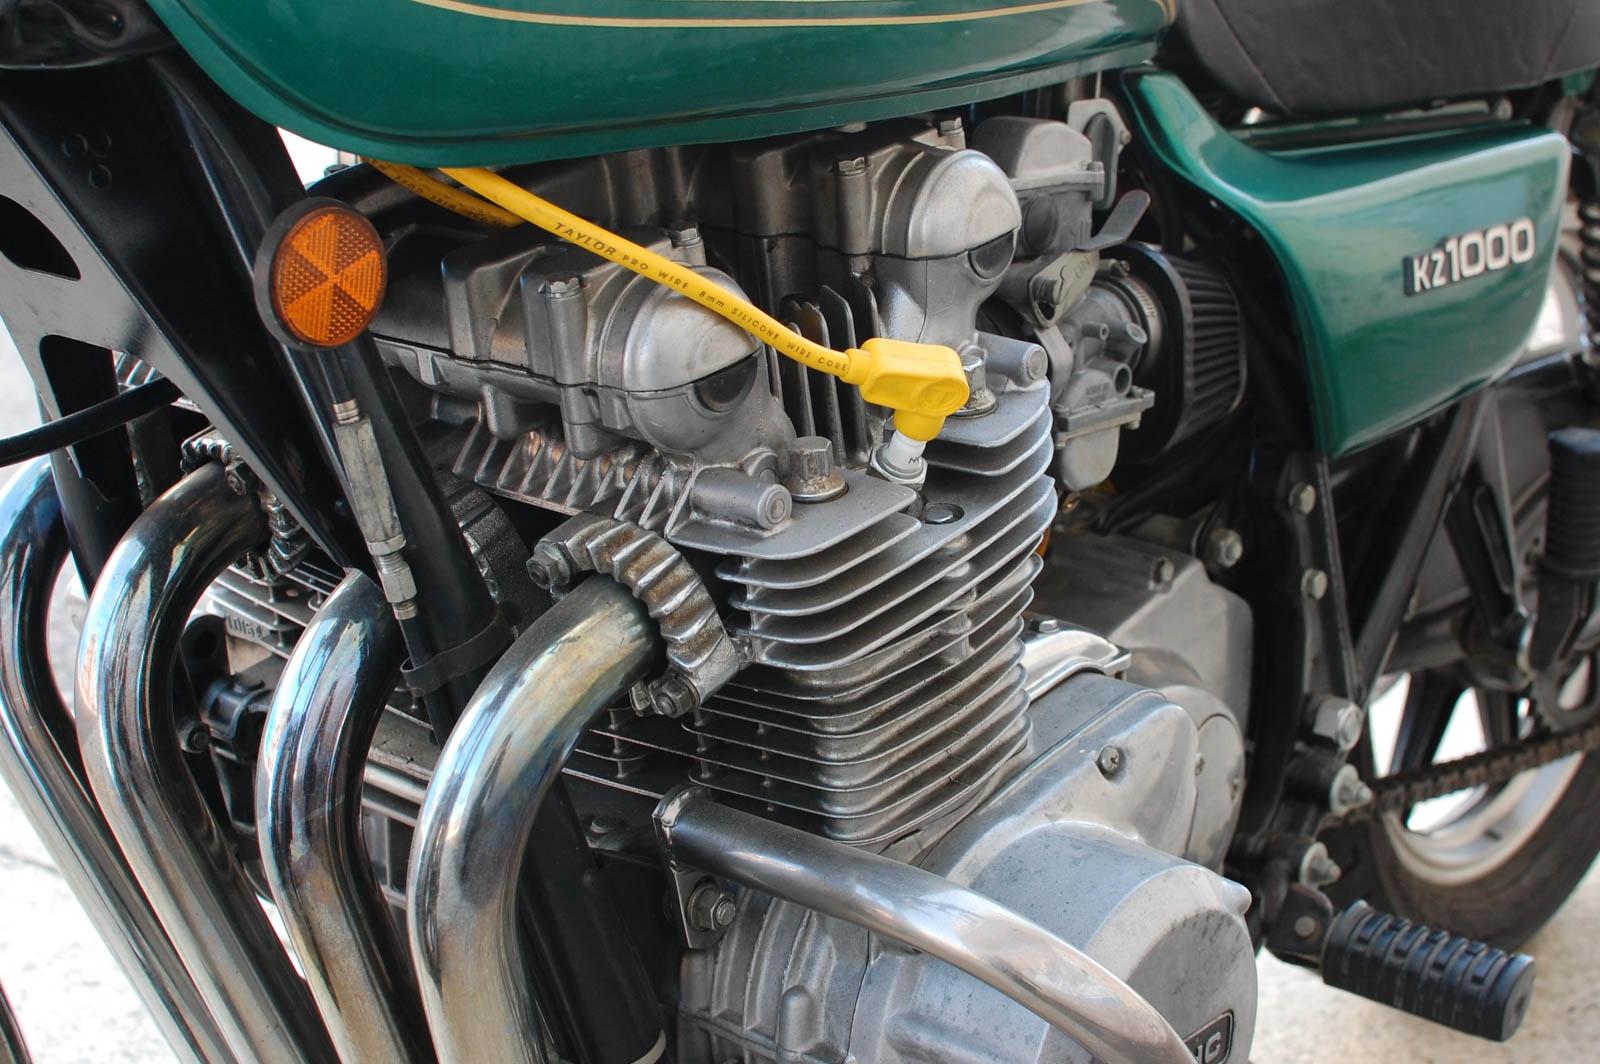 1978Kz1000-13